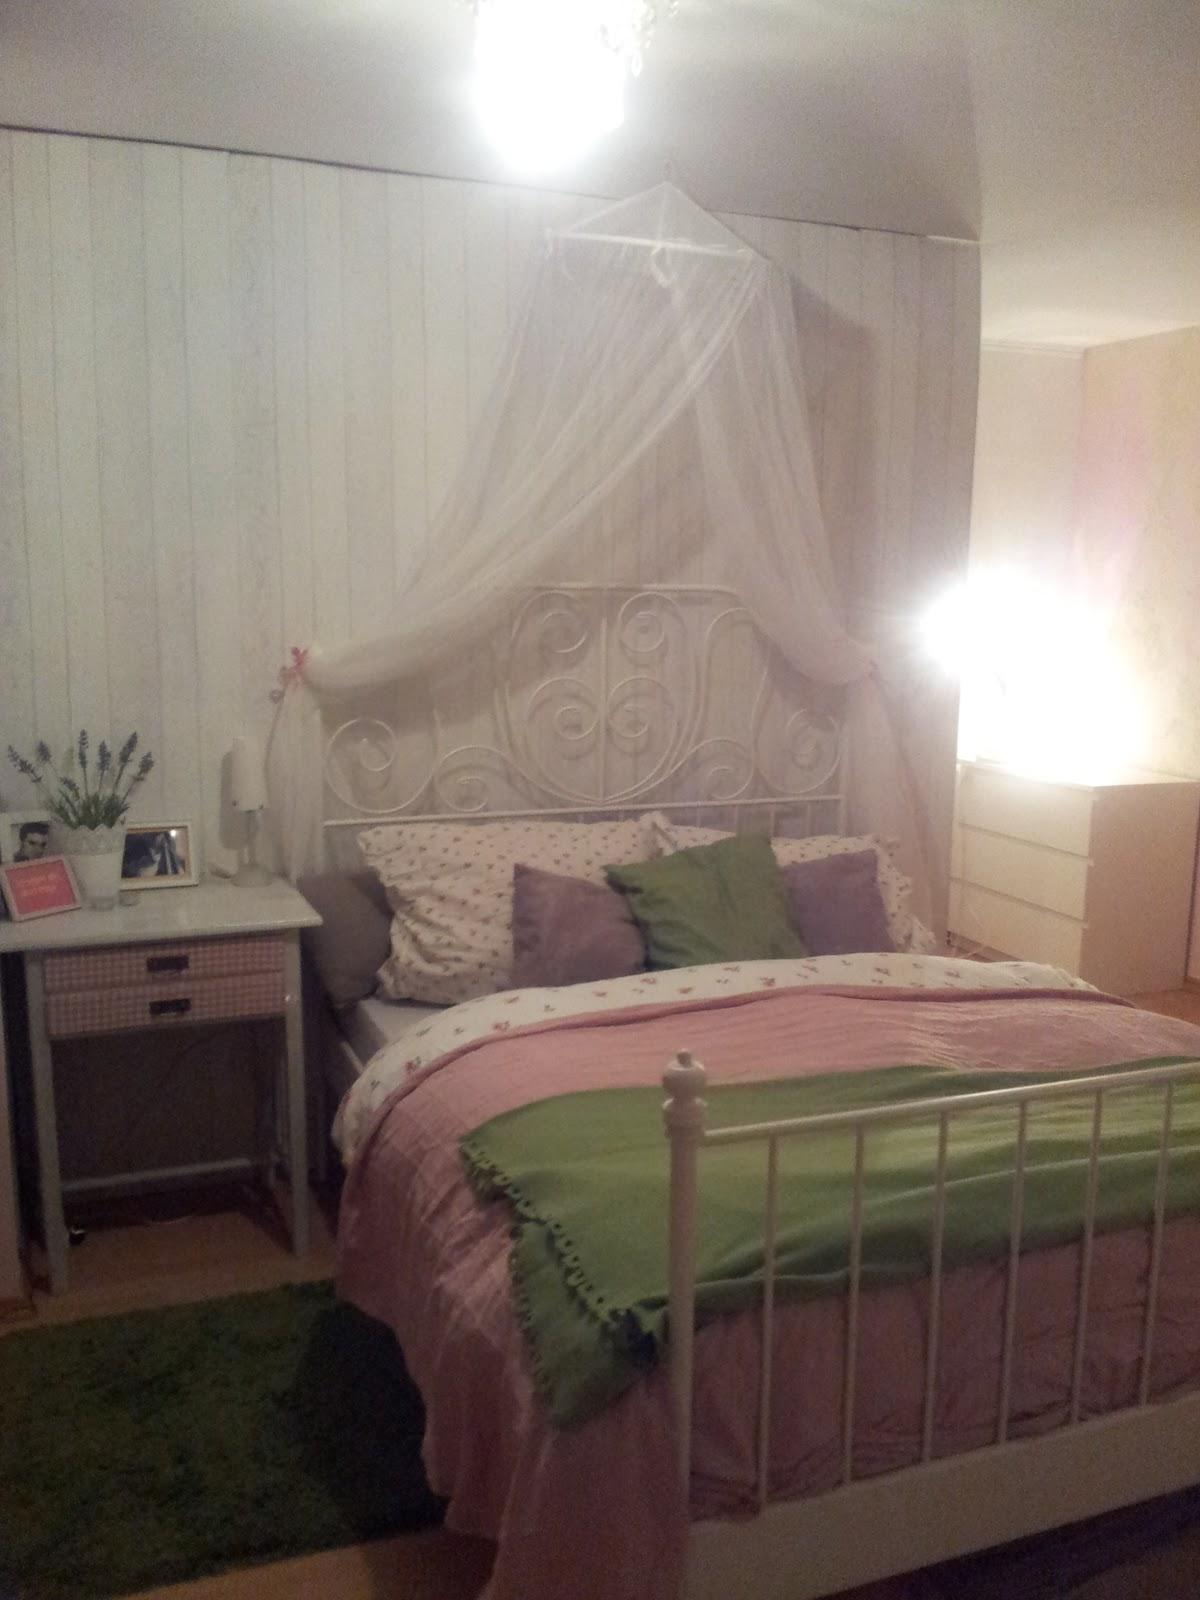 LeoLilie: Pimp my Schlafzimmer ;)